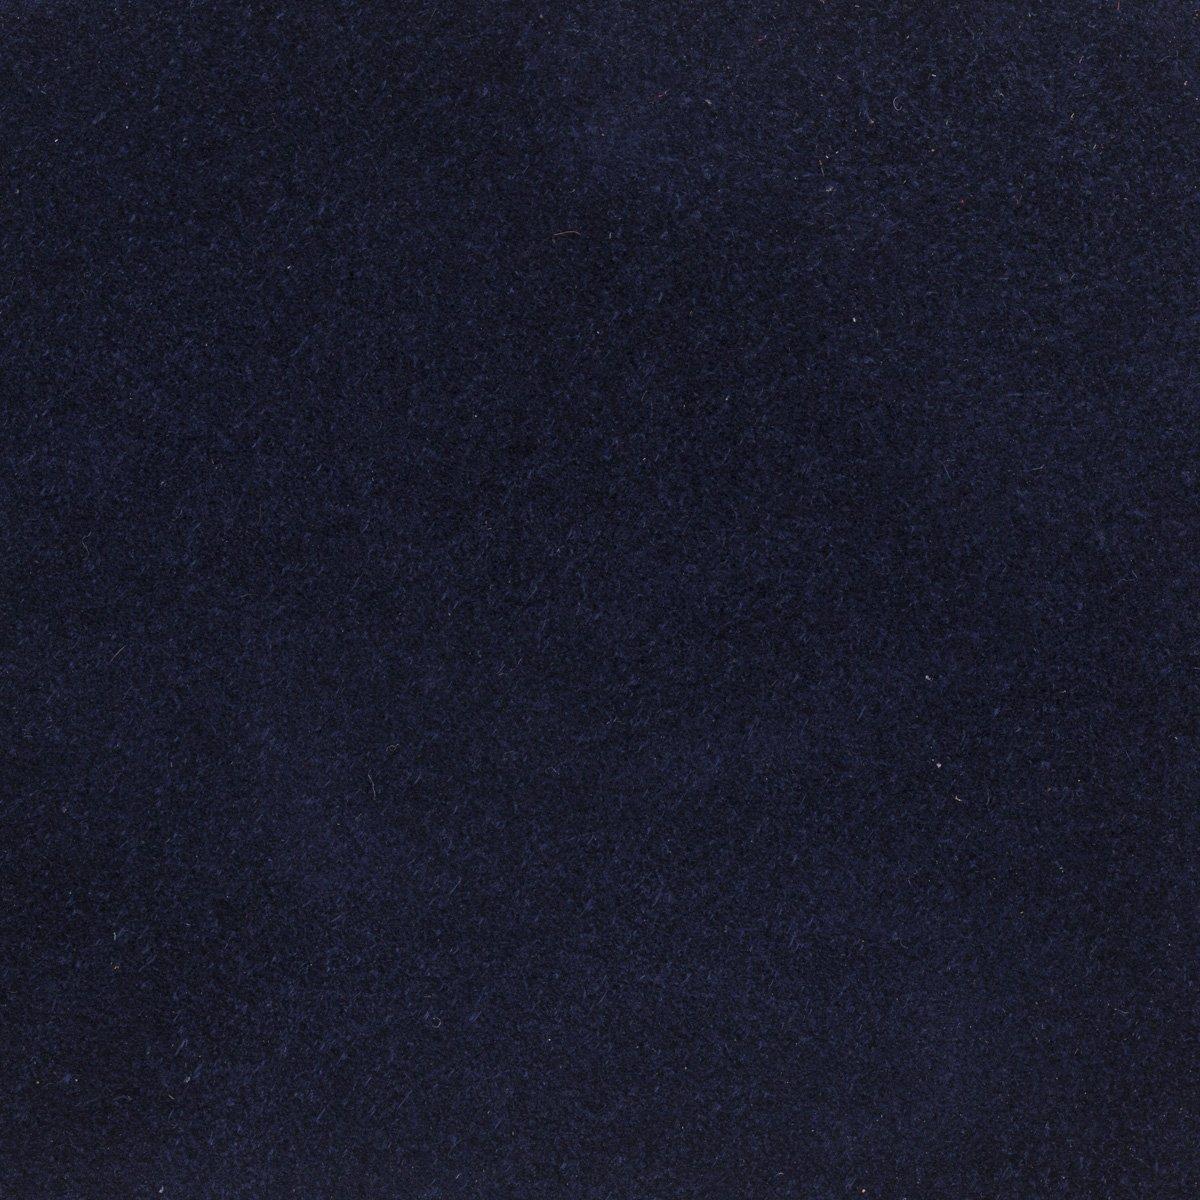 J.FitzPatrick Footwear Dark Blue Suede